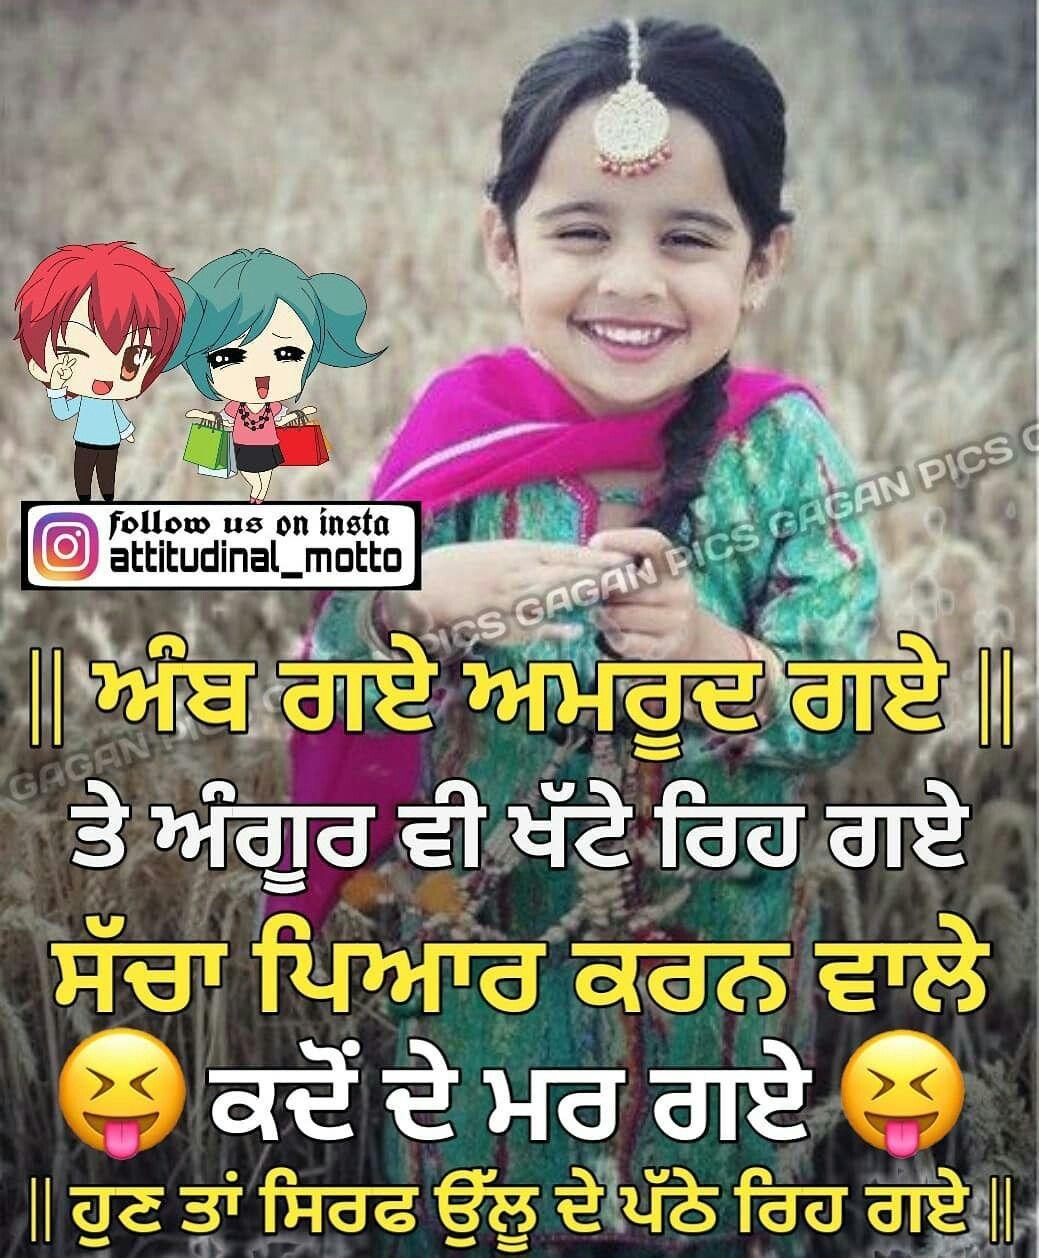 Pin by sardarni amandeep Kaur rathour on kaur Funny